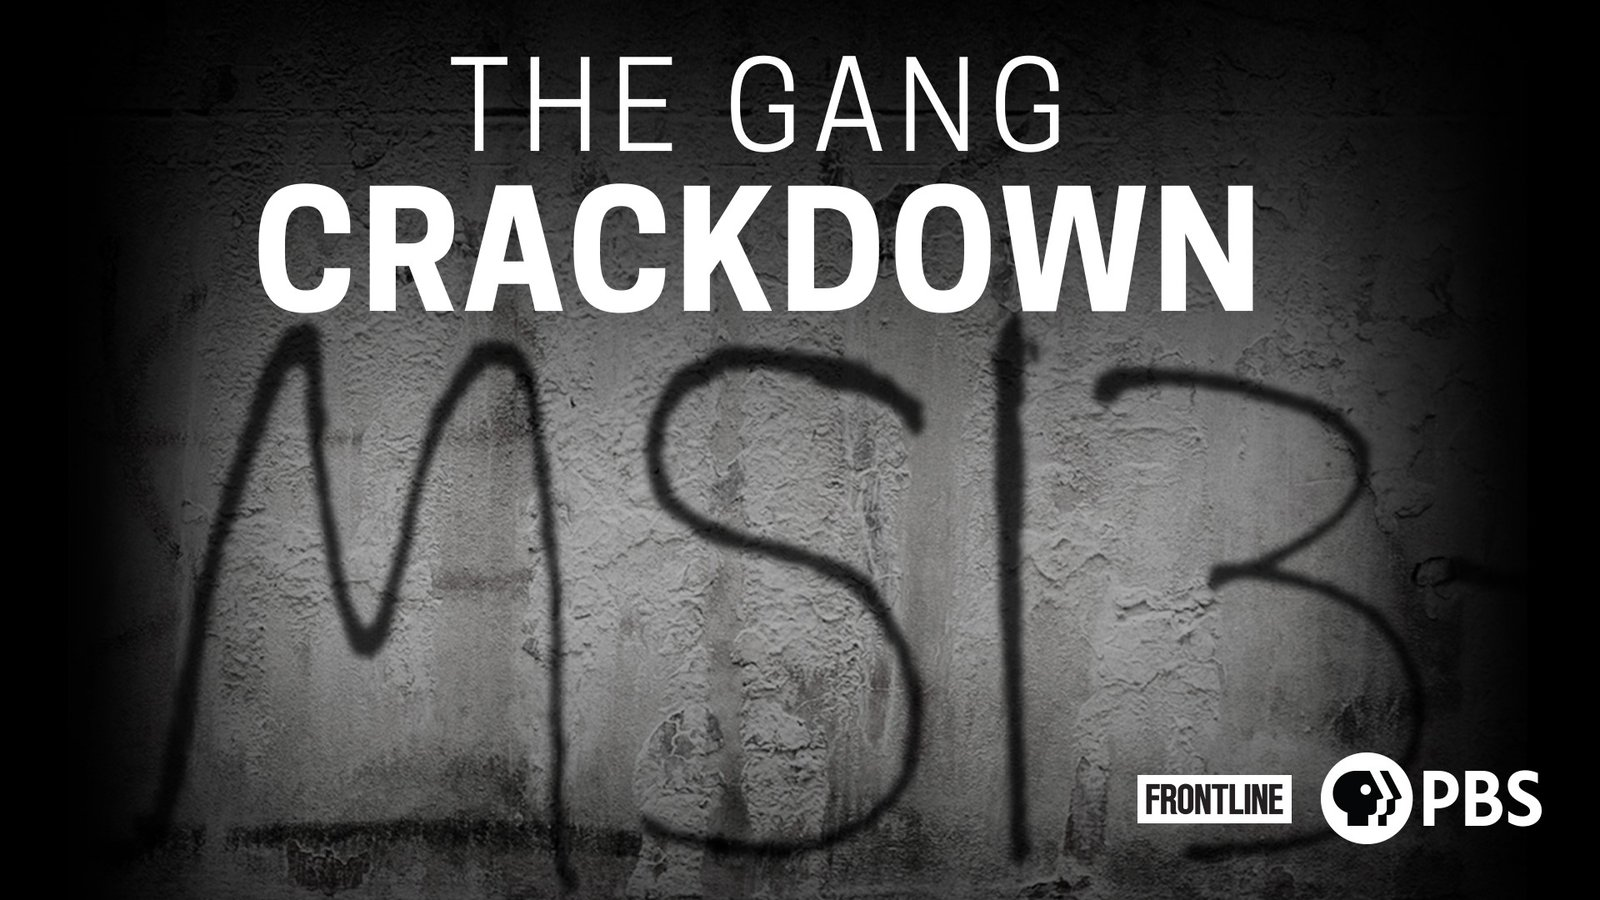 The Gang Crackdown